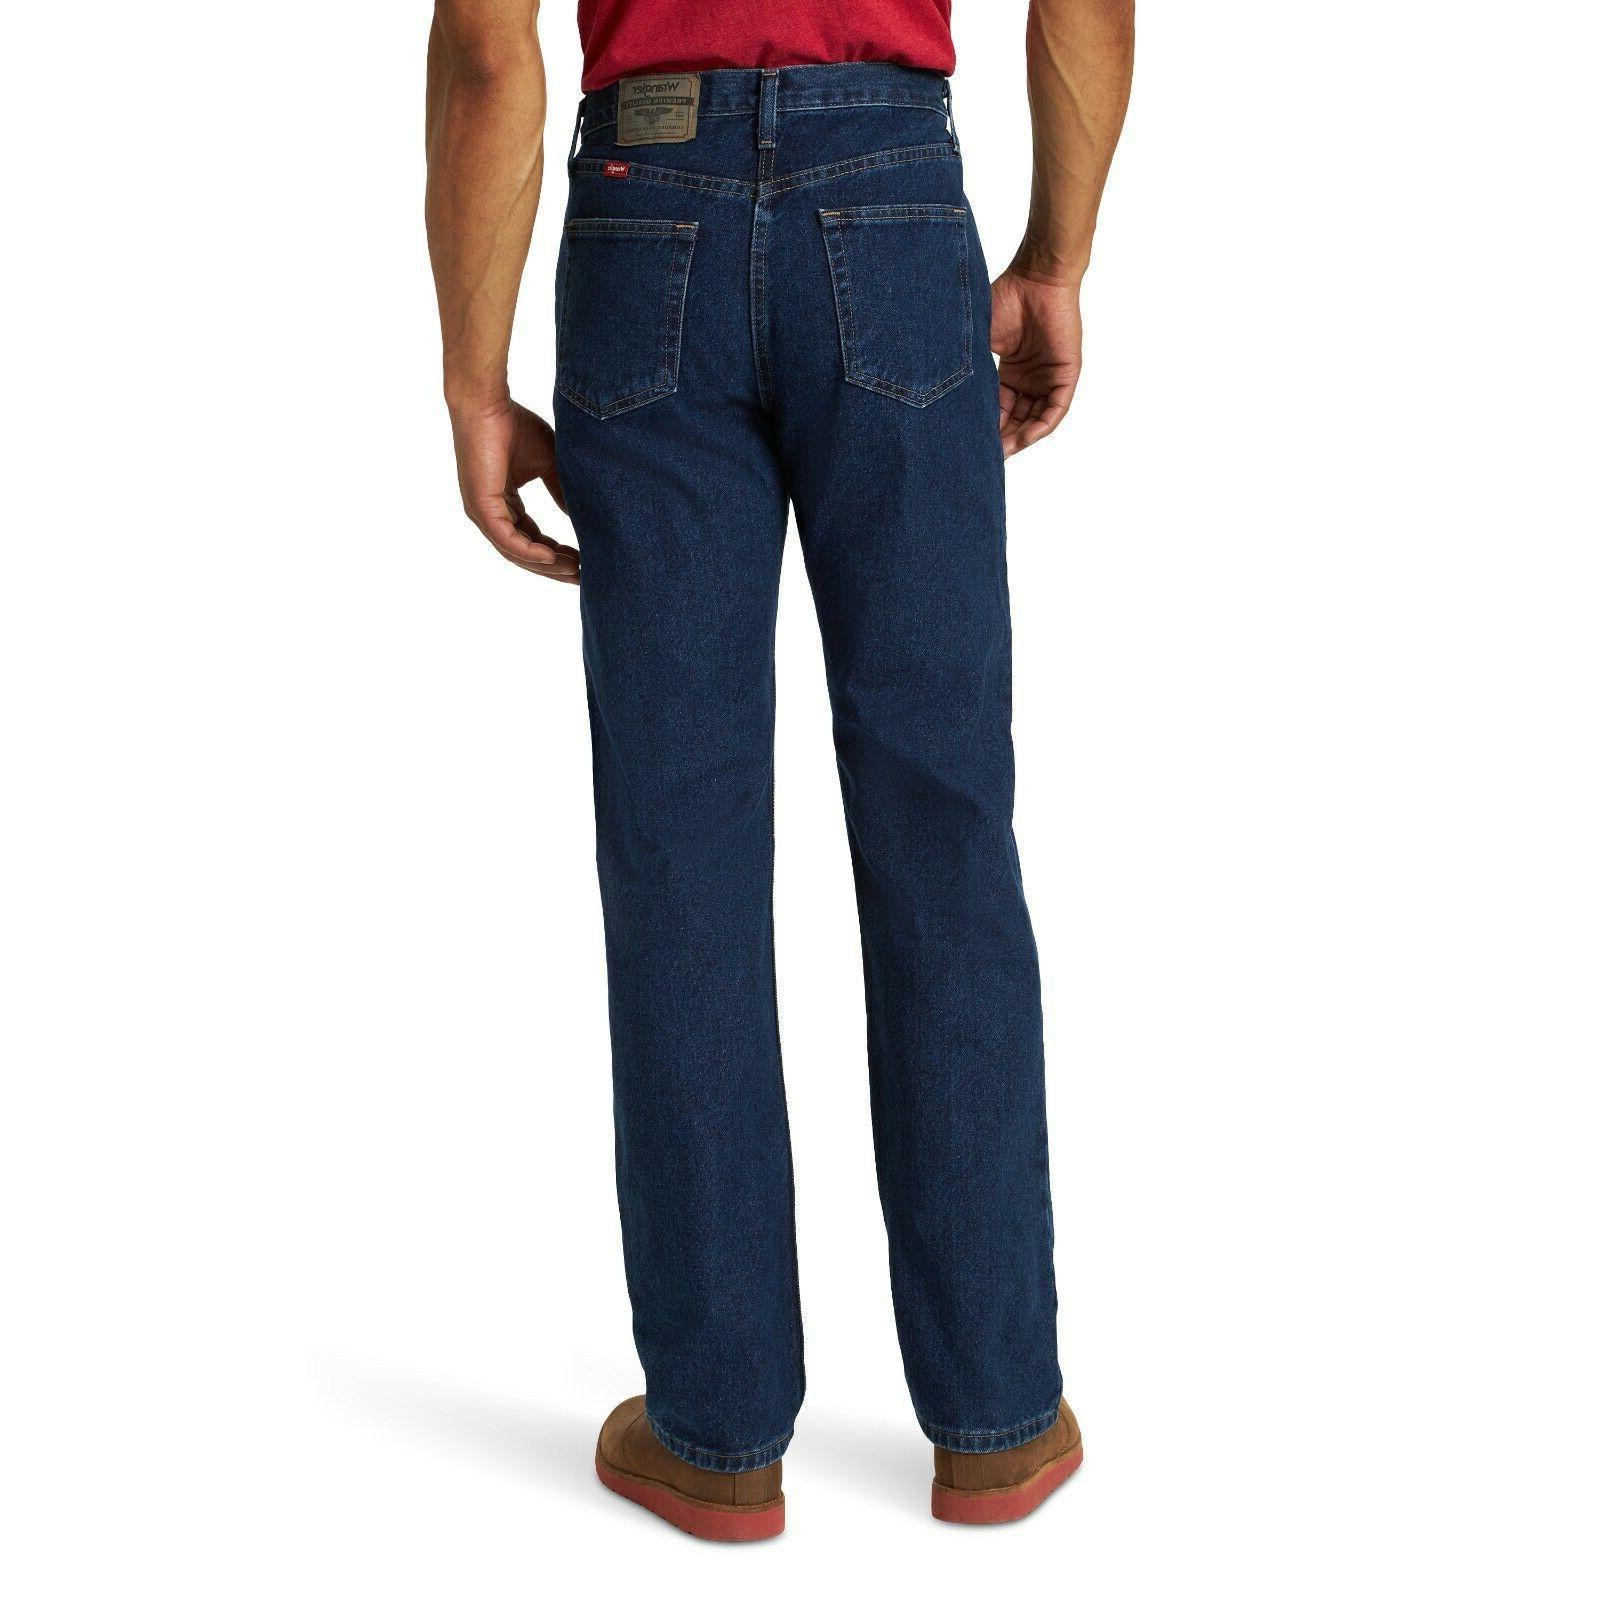 New premium Fit Jeans Men's Size Dark indigo